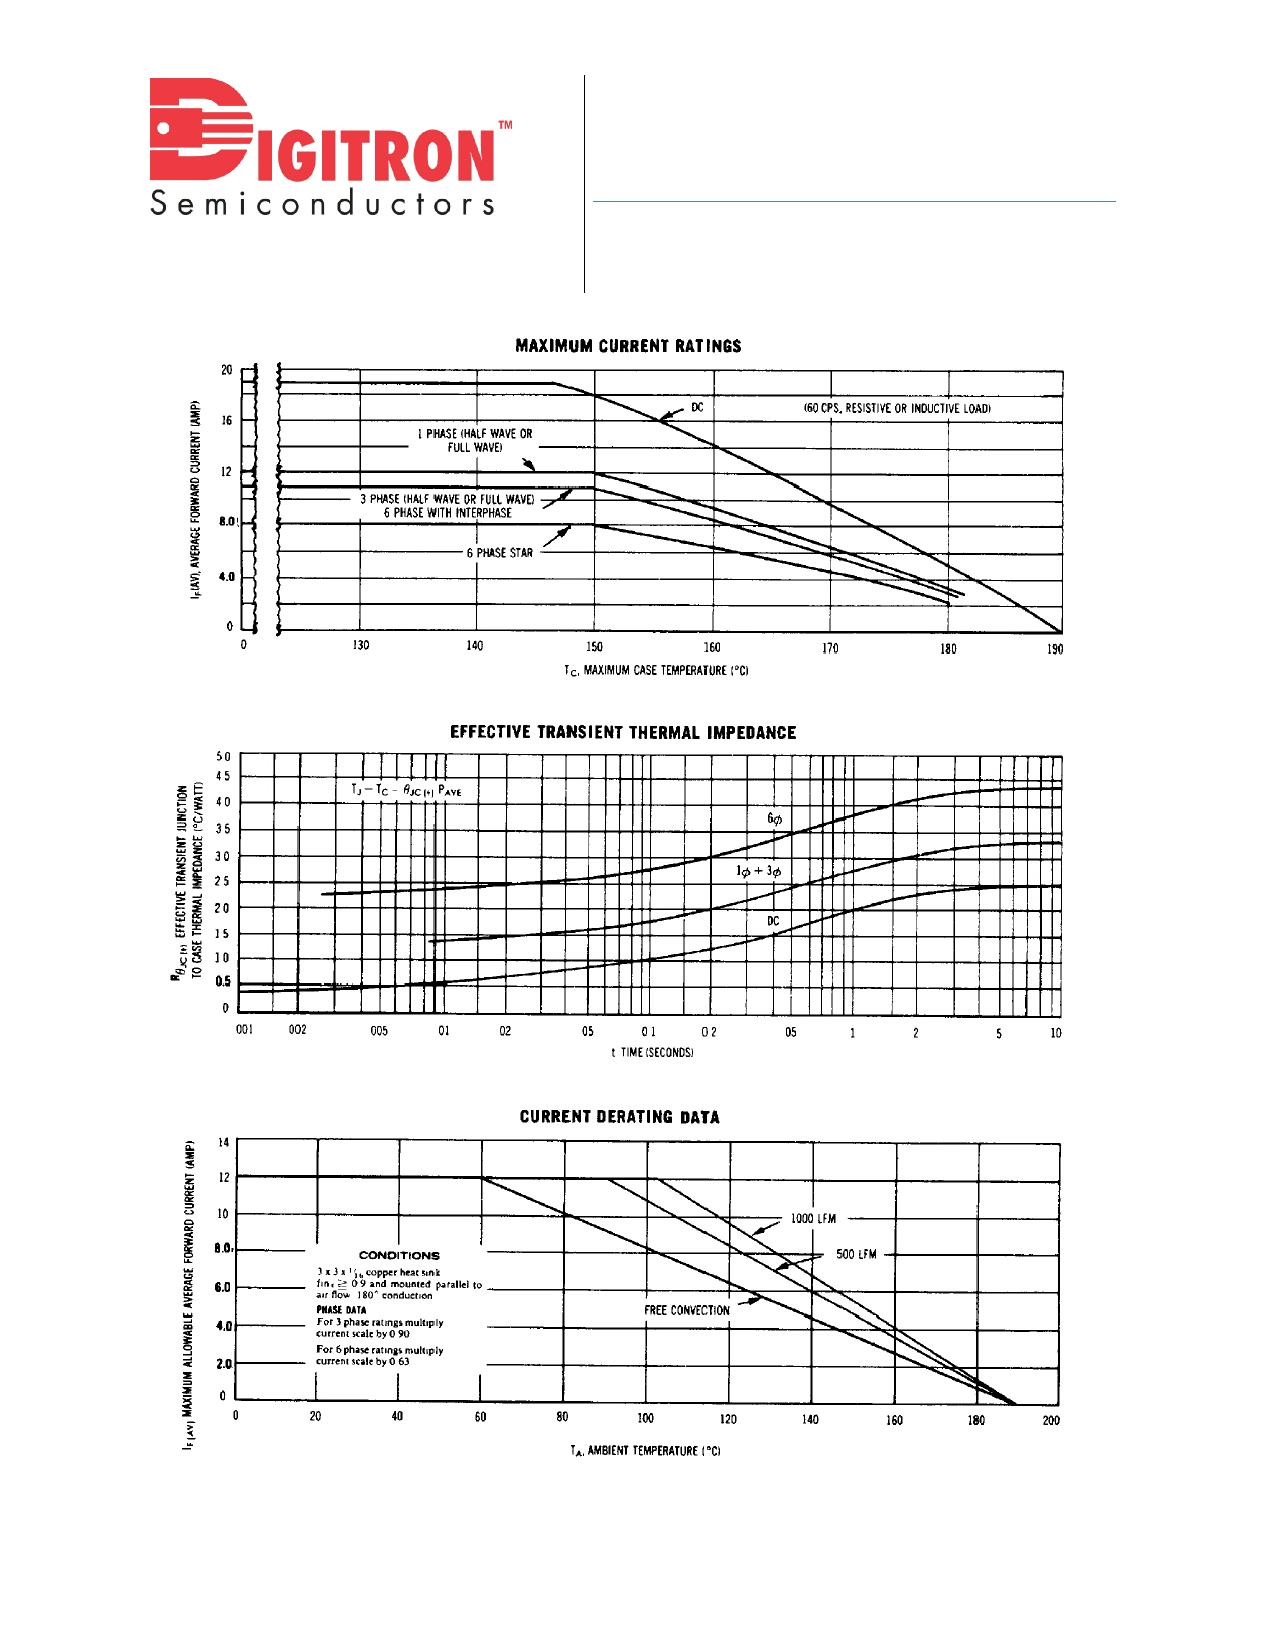 MR1121 pdf, 반도체, 판매, 대치품